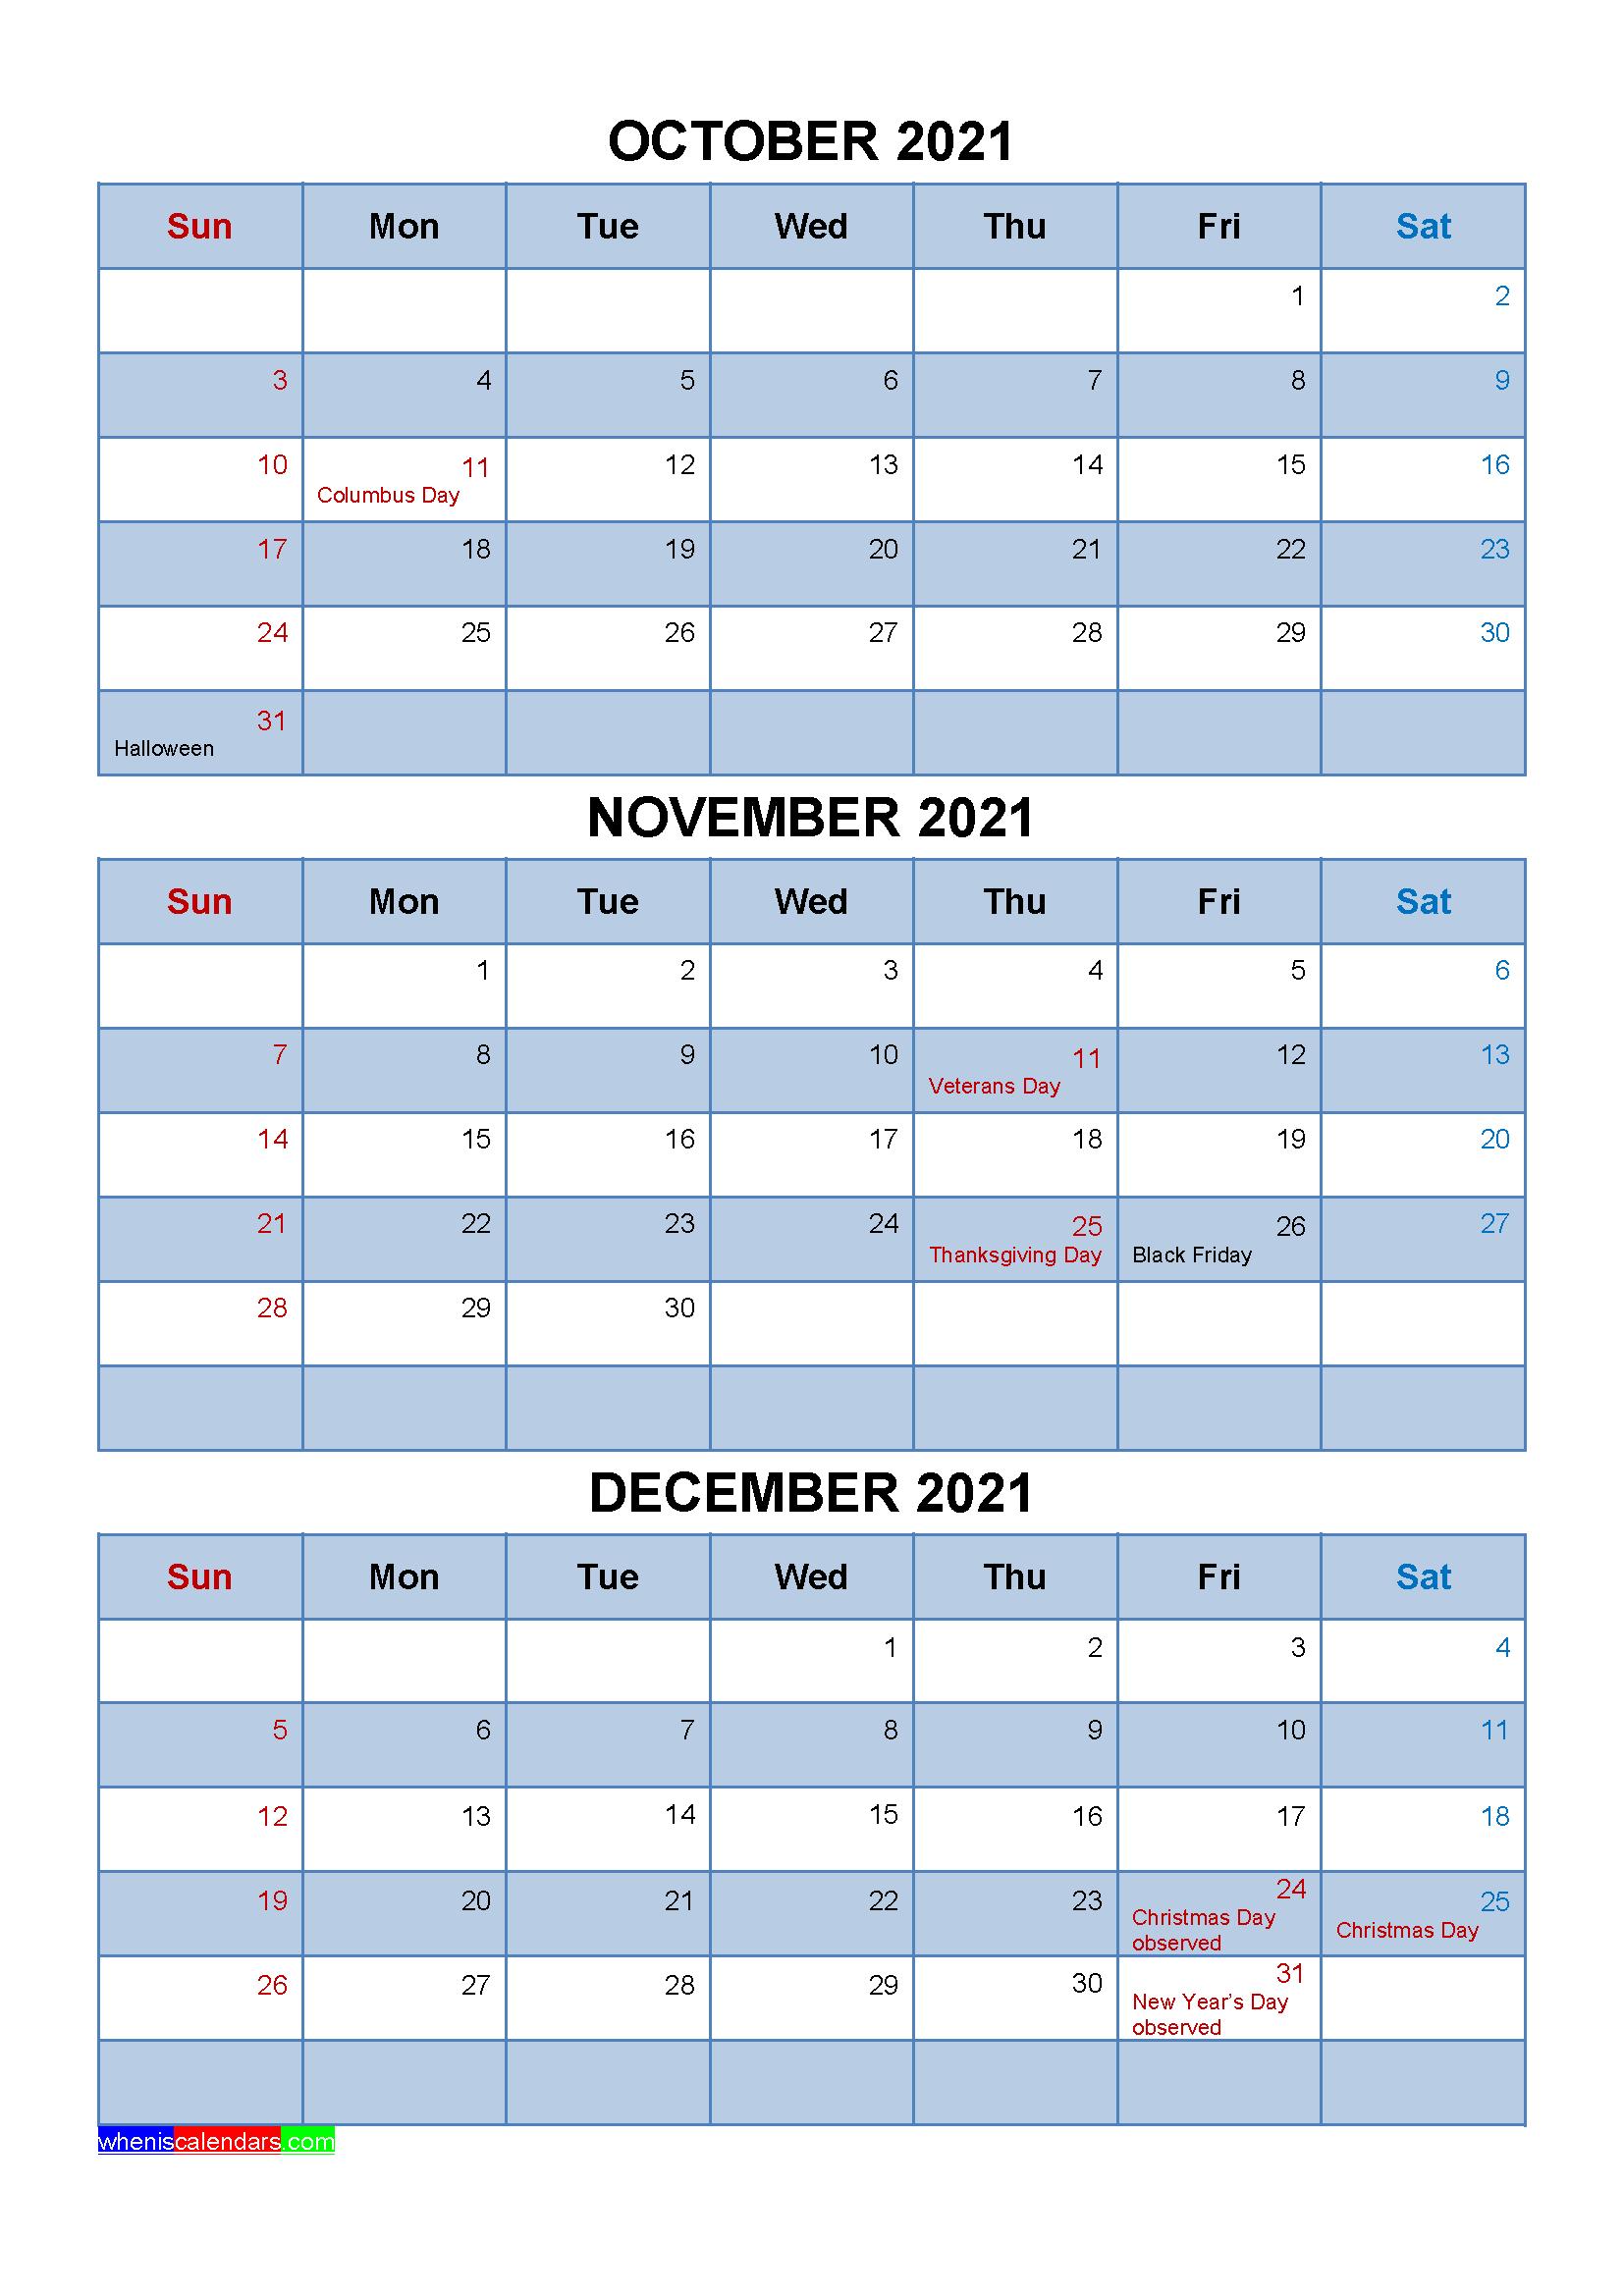 Free Calendar October November December 2021 with Holidays